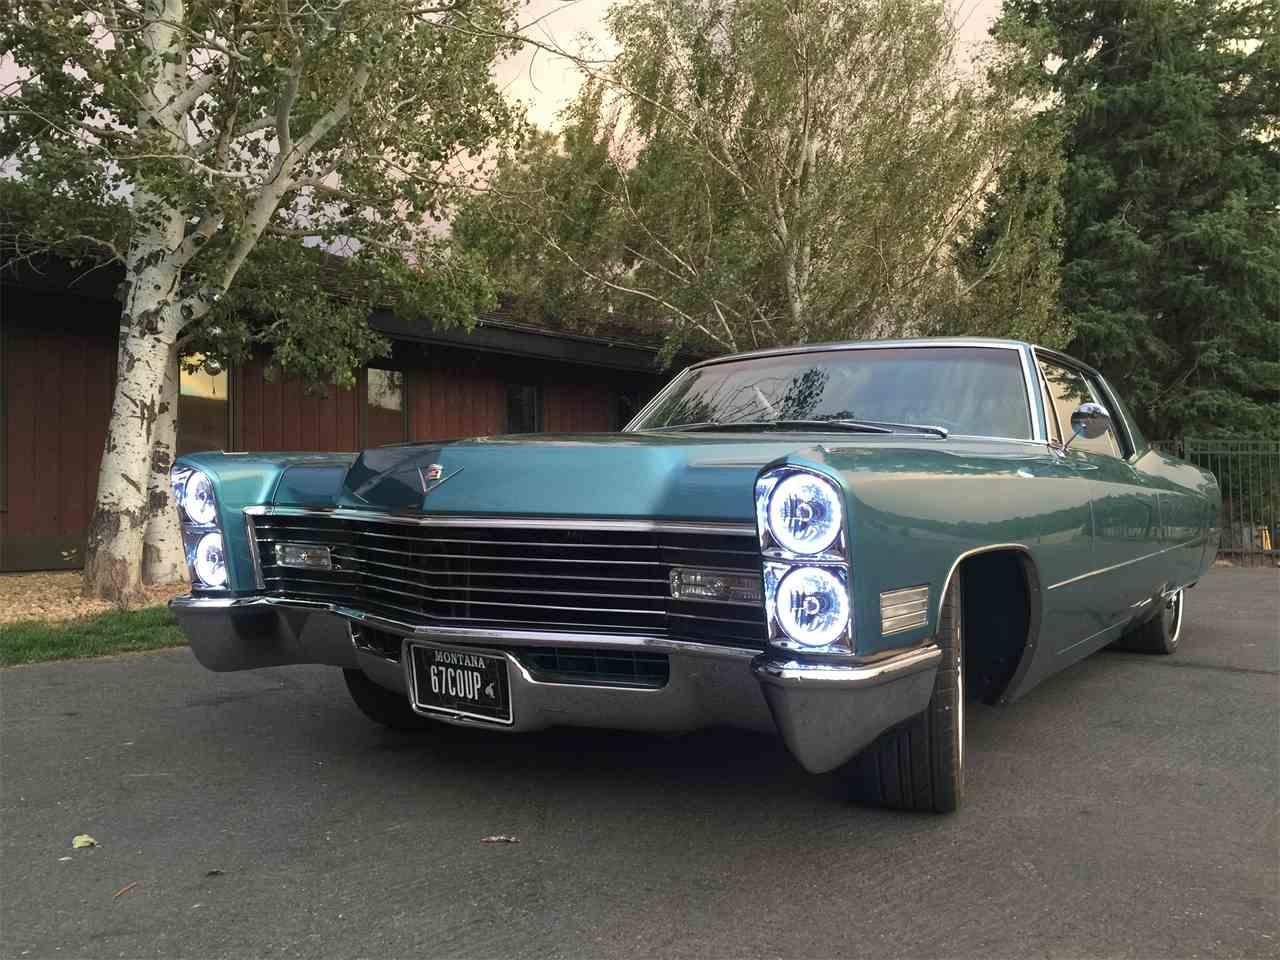 1967 Cadillac Sedan Deville Interior